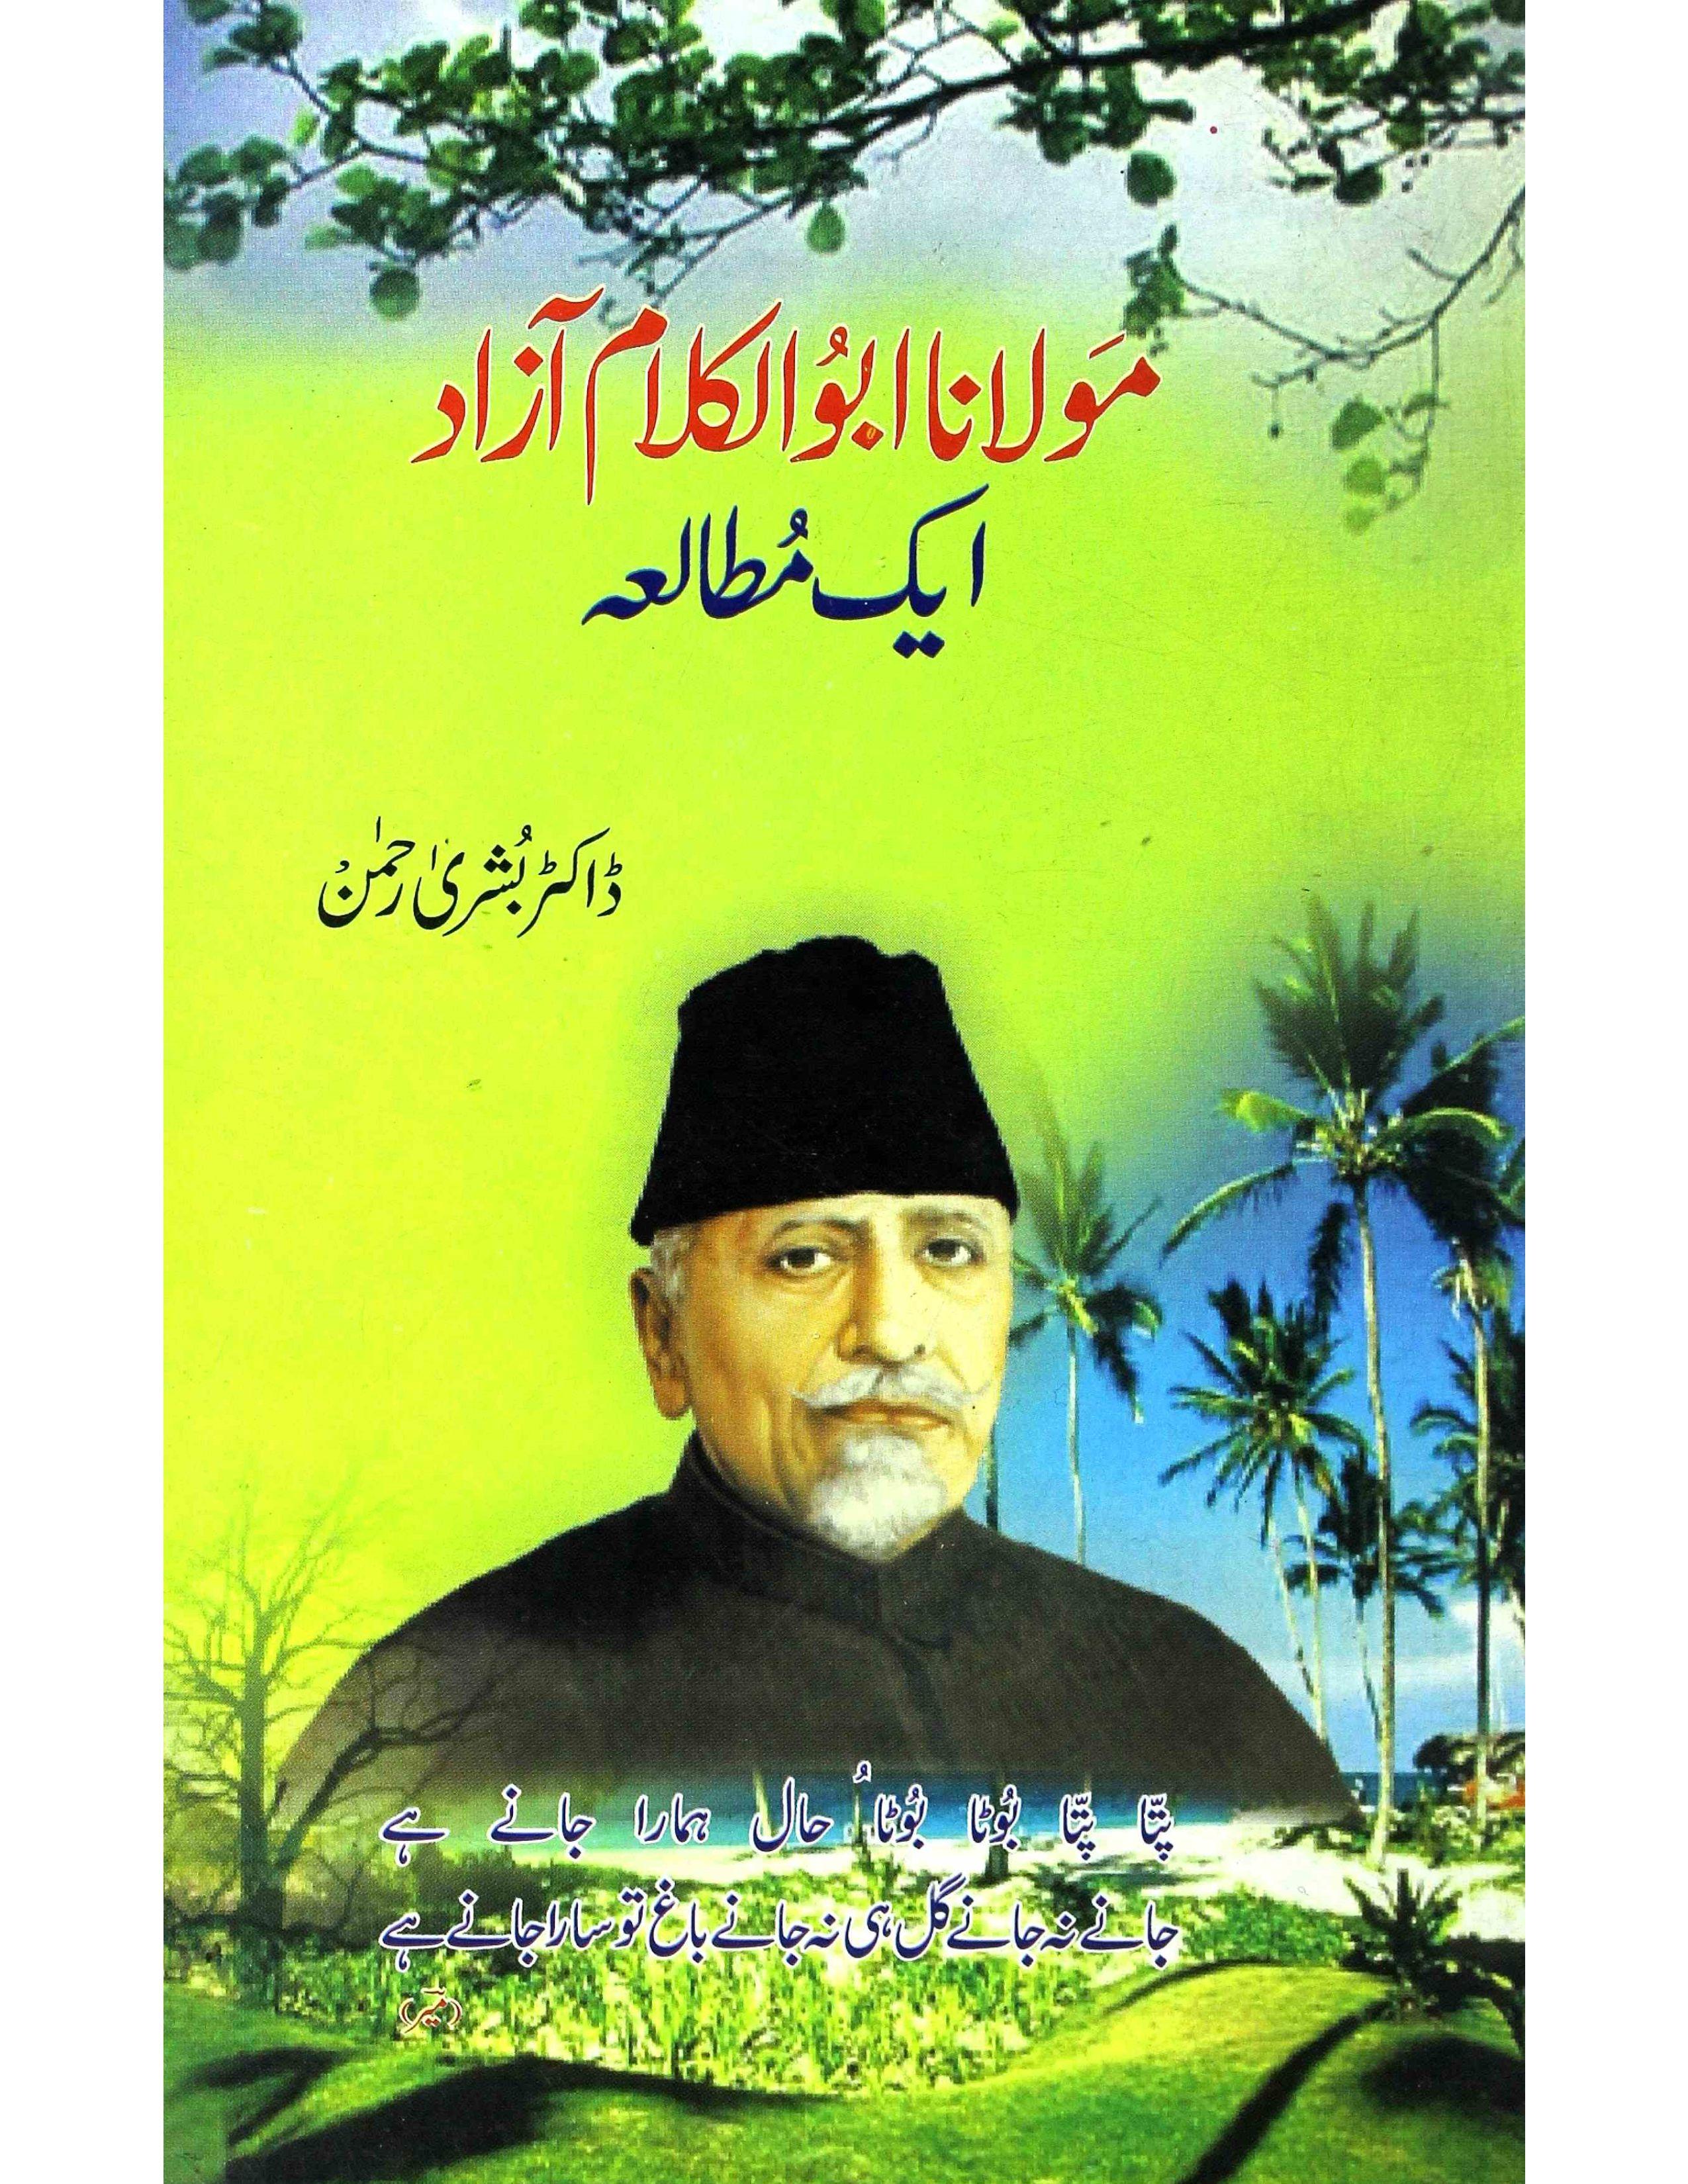 Maulana Abul Kalam Aazad Ek Mutala